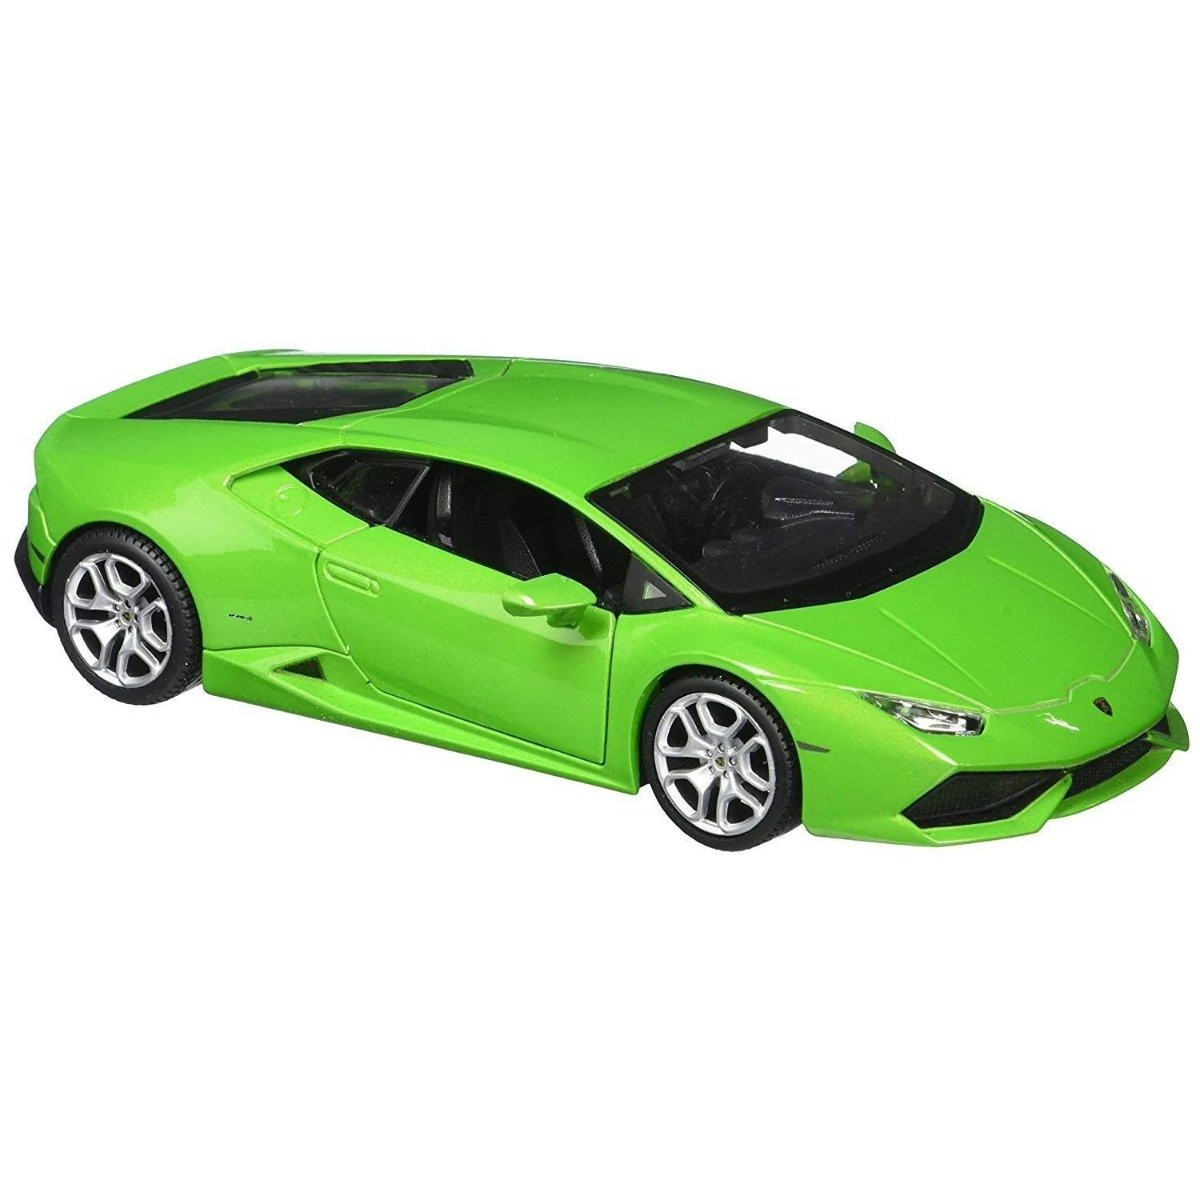 Masinuta Maisto Lamborghini Huracan LP 610-4,1:24, Verde